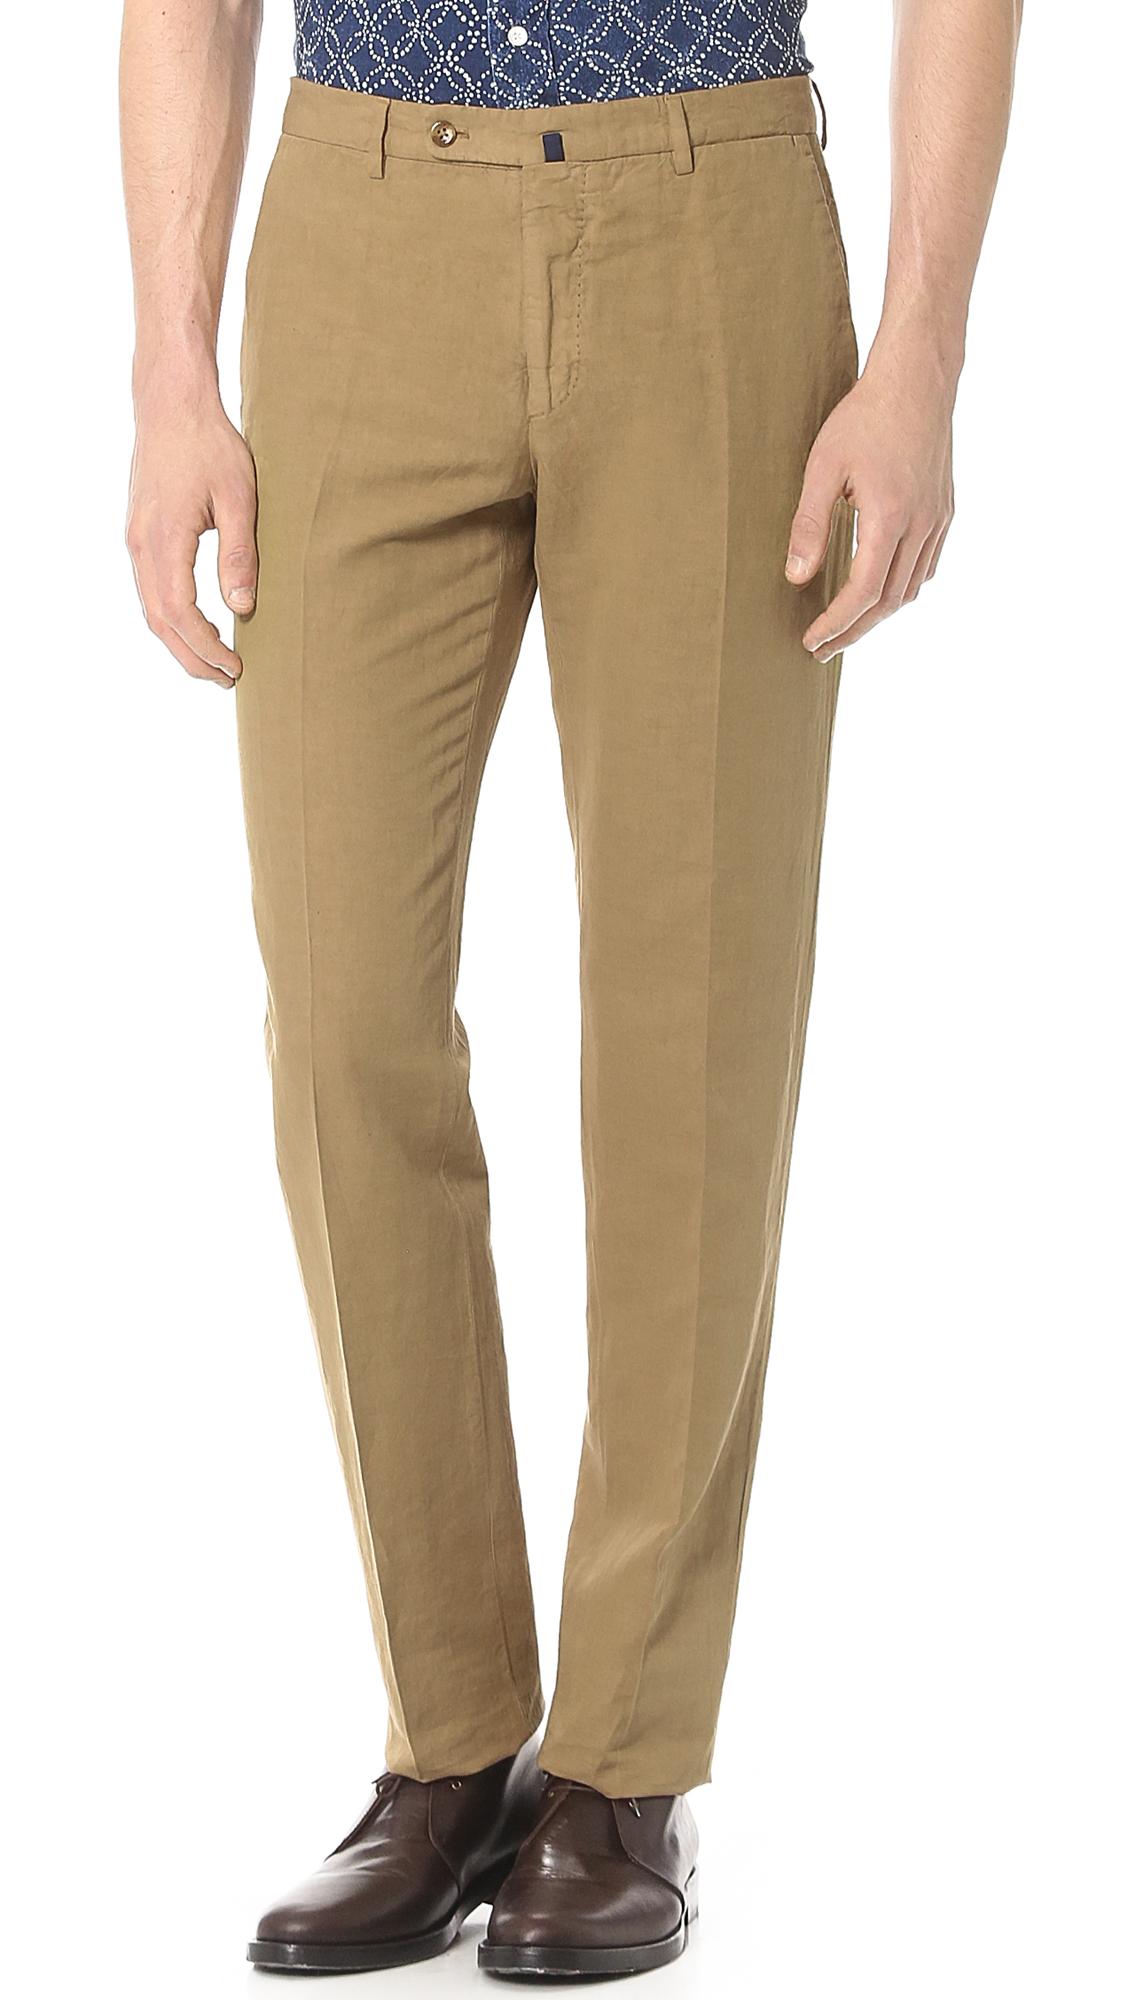 Incotex Chinolino Trousers   EAST DANE f6a06e0e91